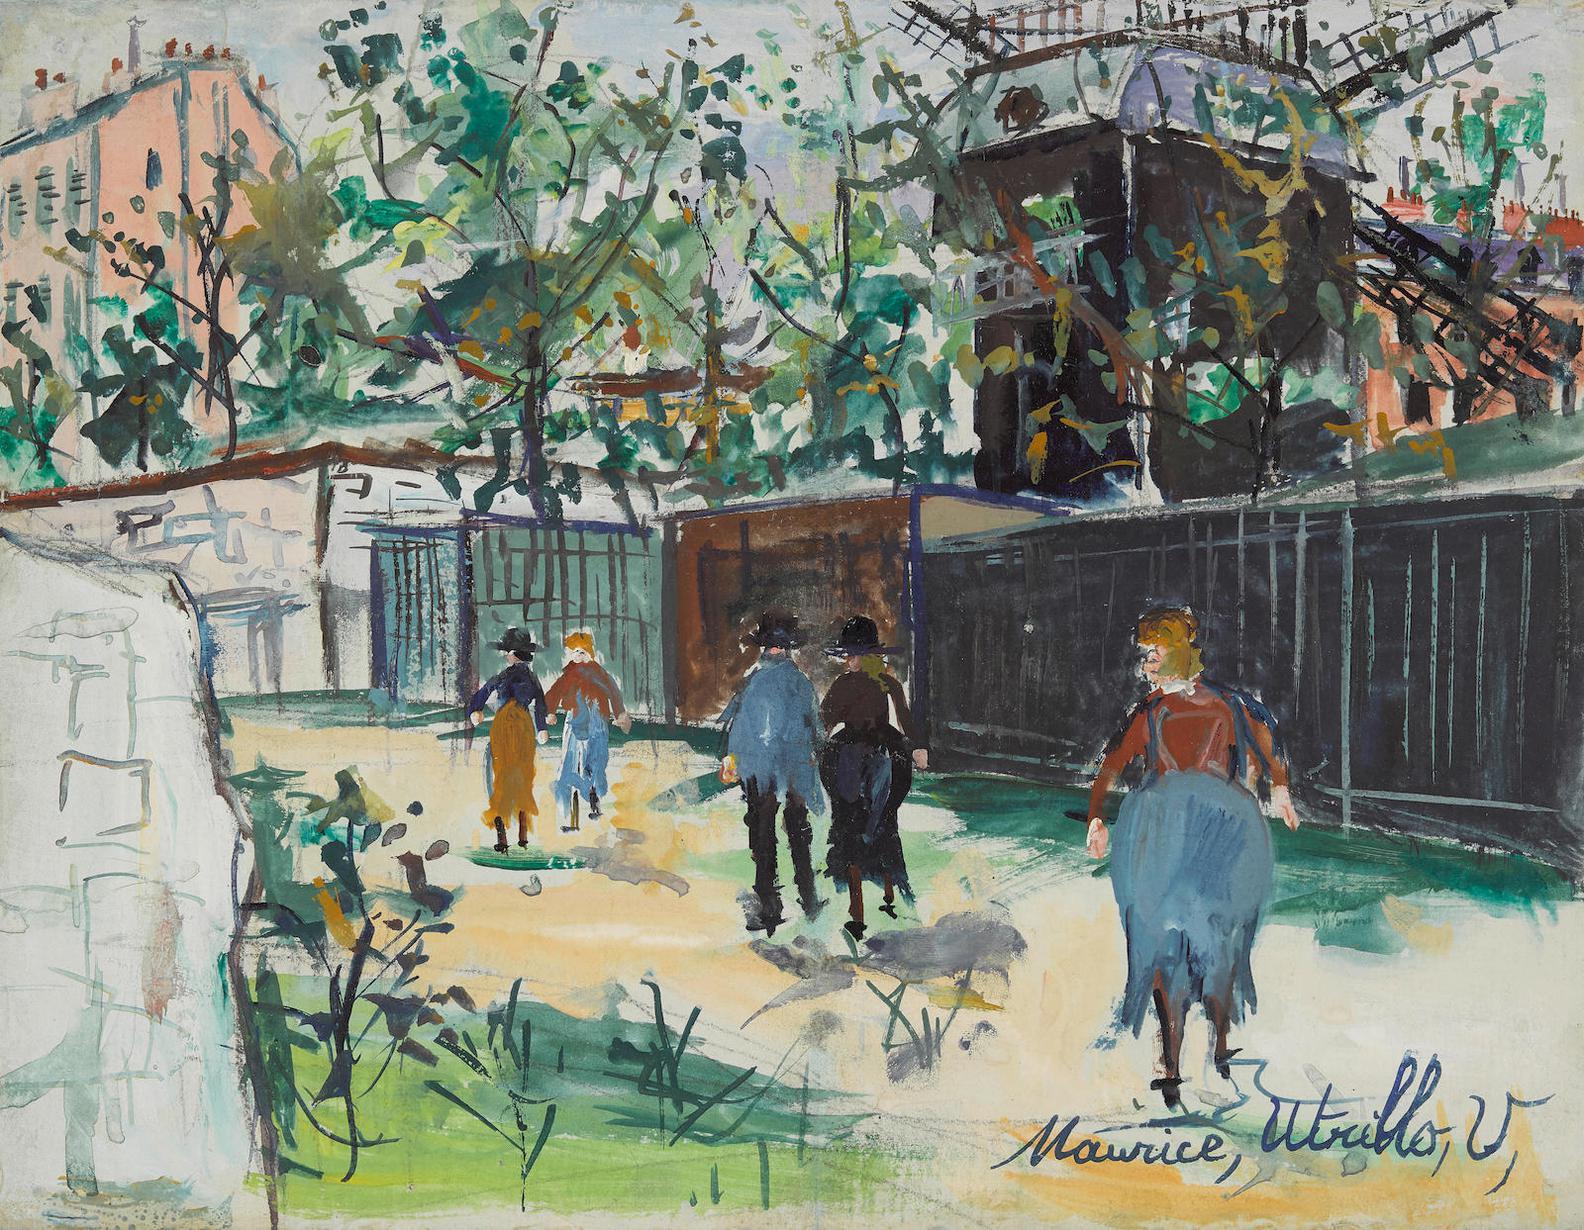 Maurice Utrillo-Le Moulin De La Galette-1930